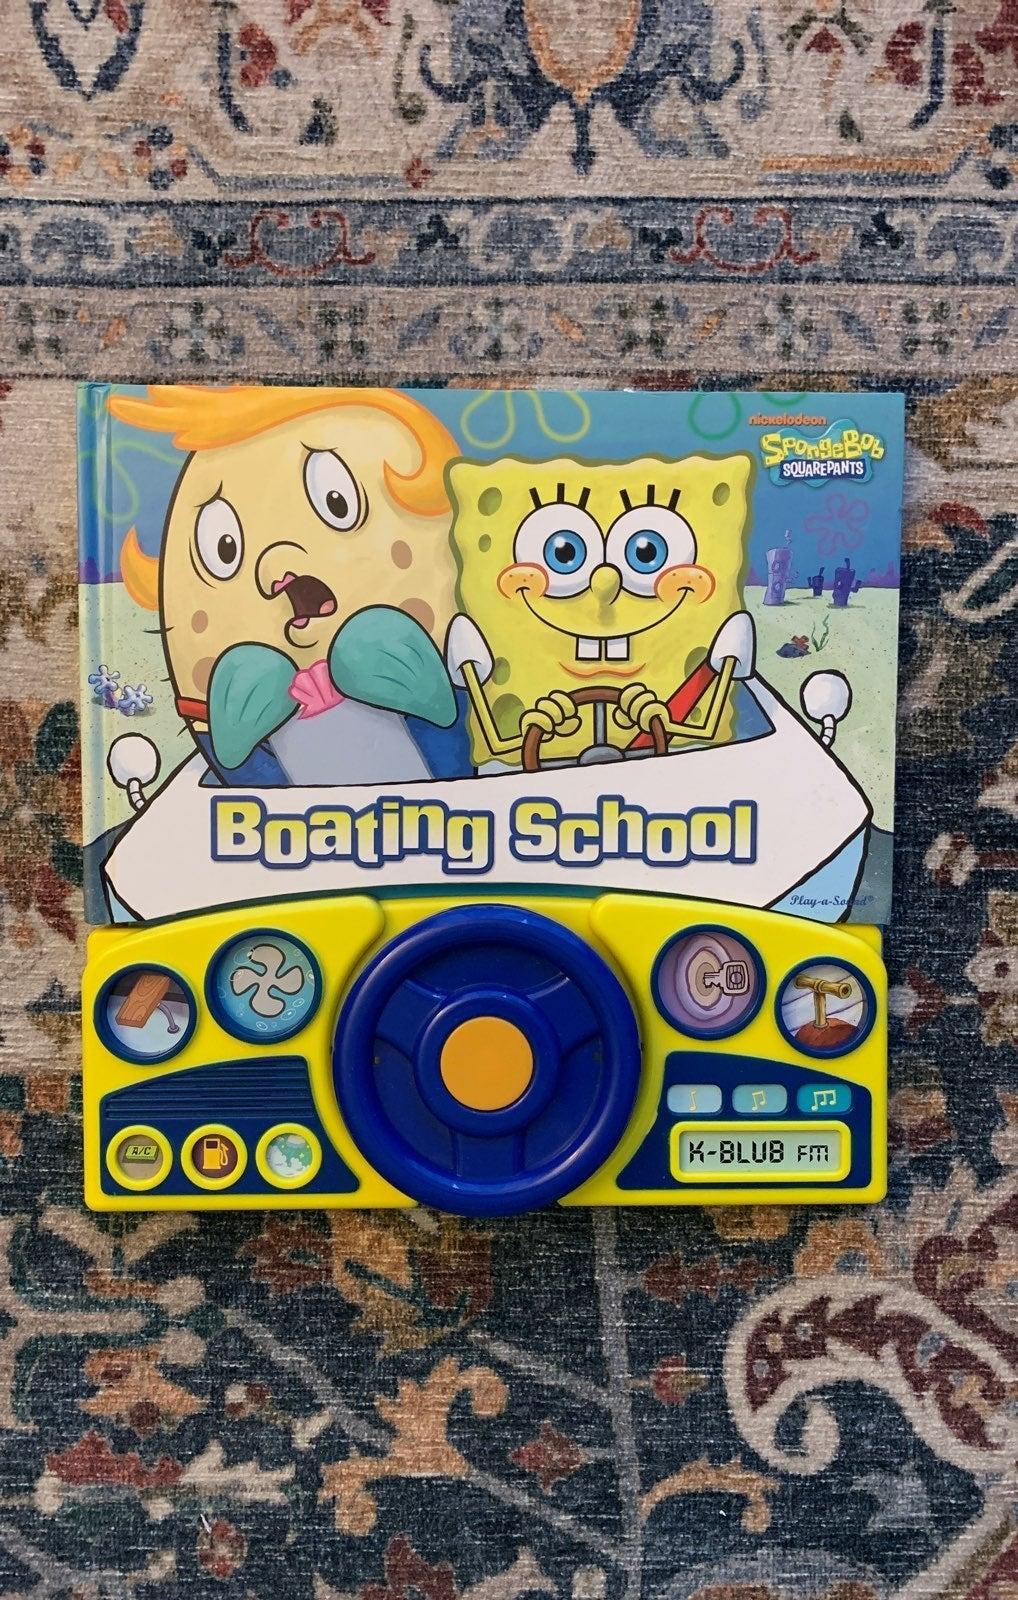 SpongeBob SquarePants Sound Book